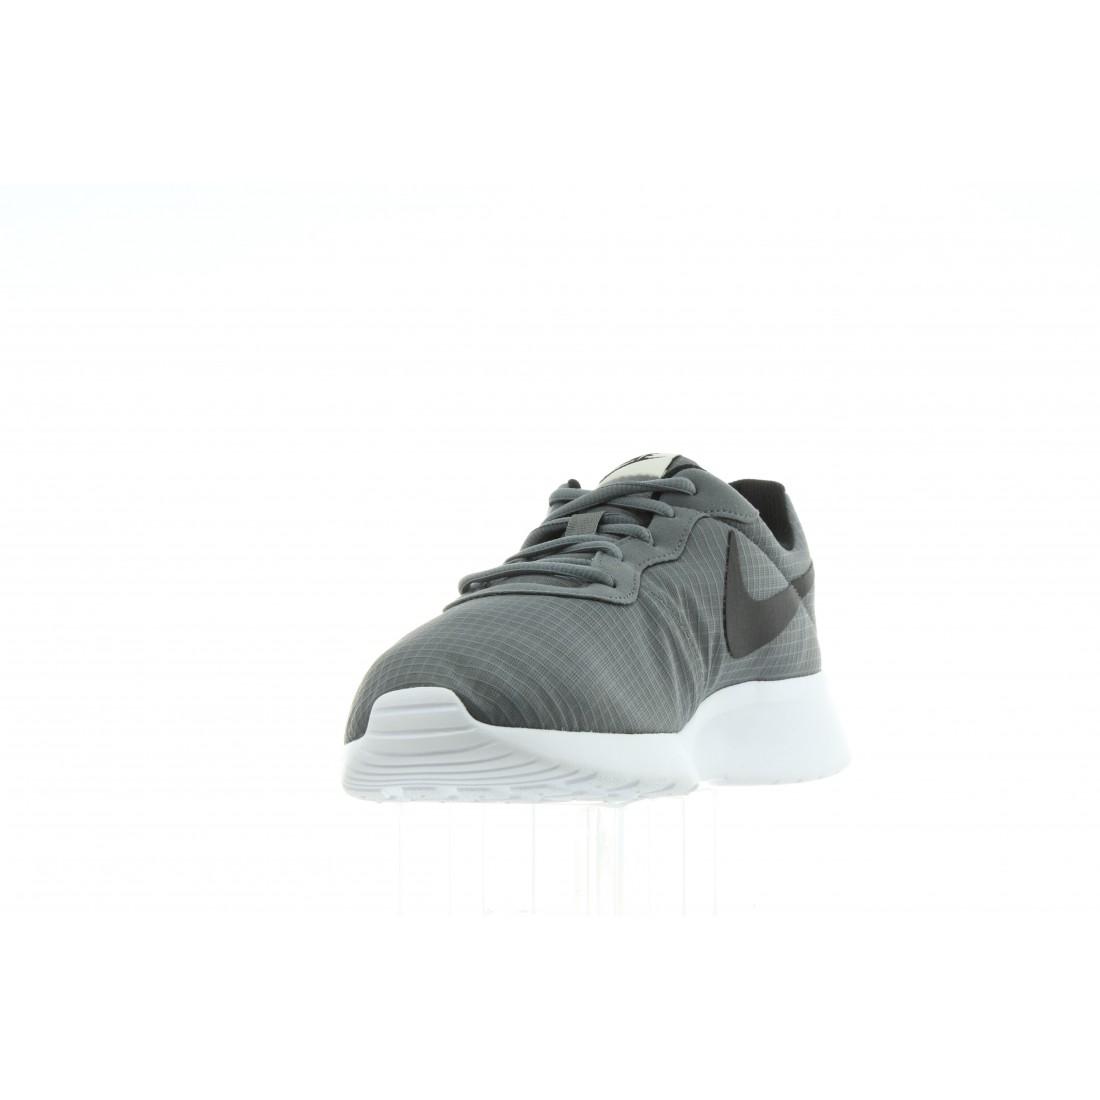 9671c57f Buty Nike Tanjun Premium 876899 002